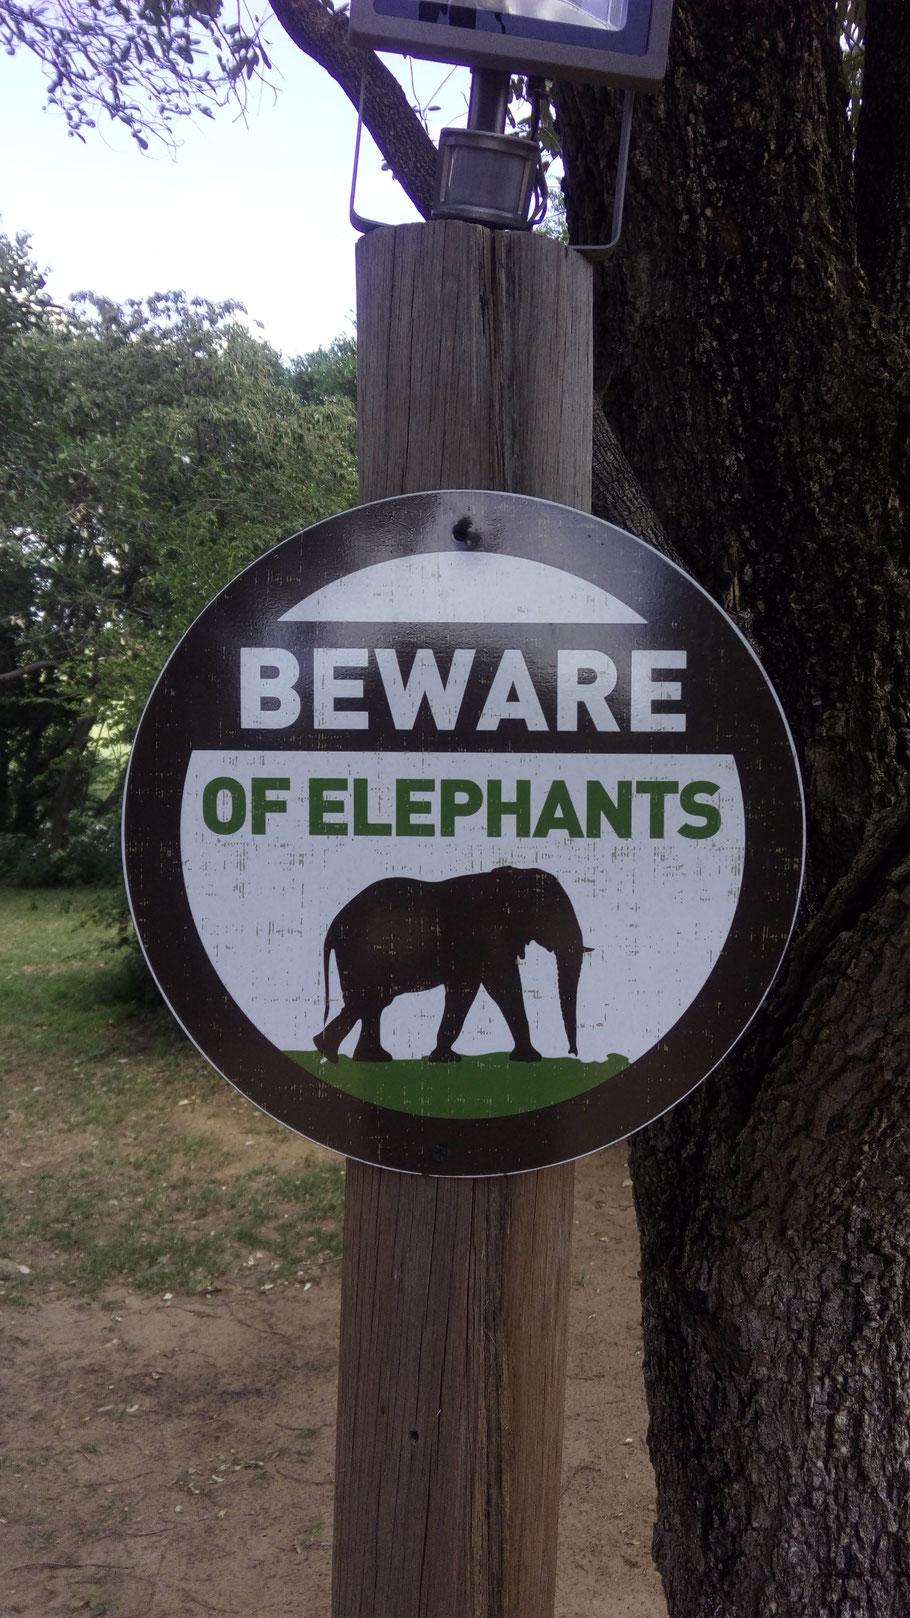 Hinweisschild im Park